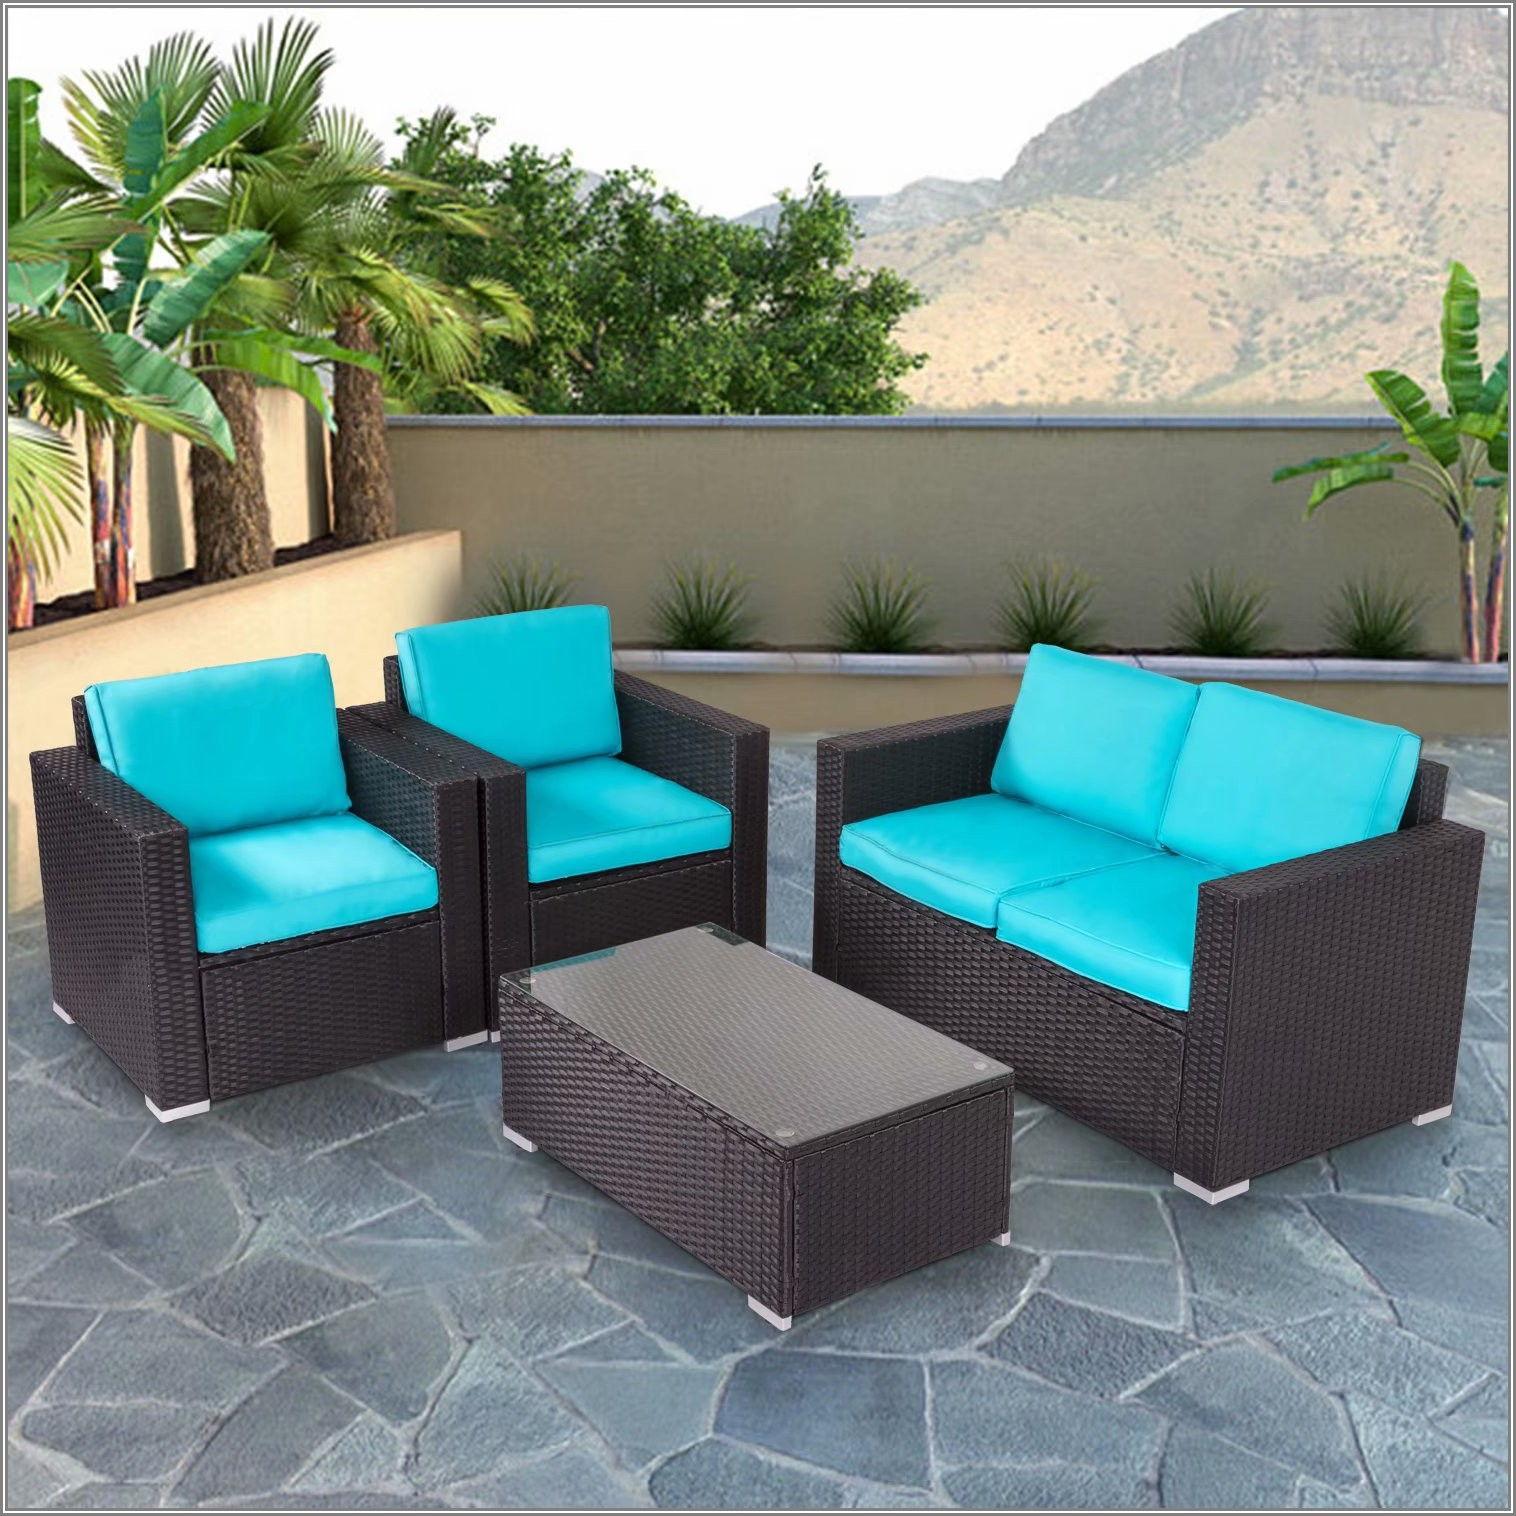 Kinbor Patio Furniture Cushions